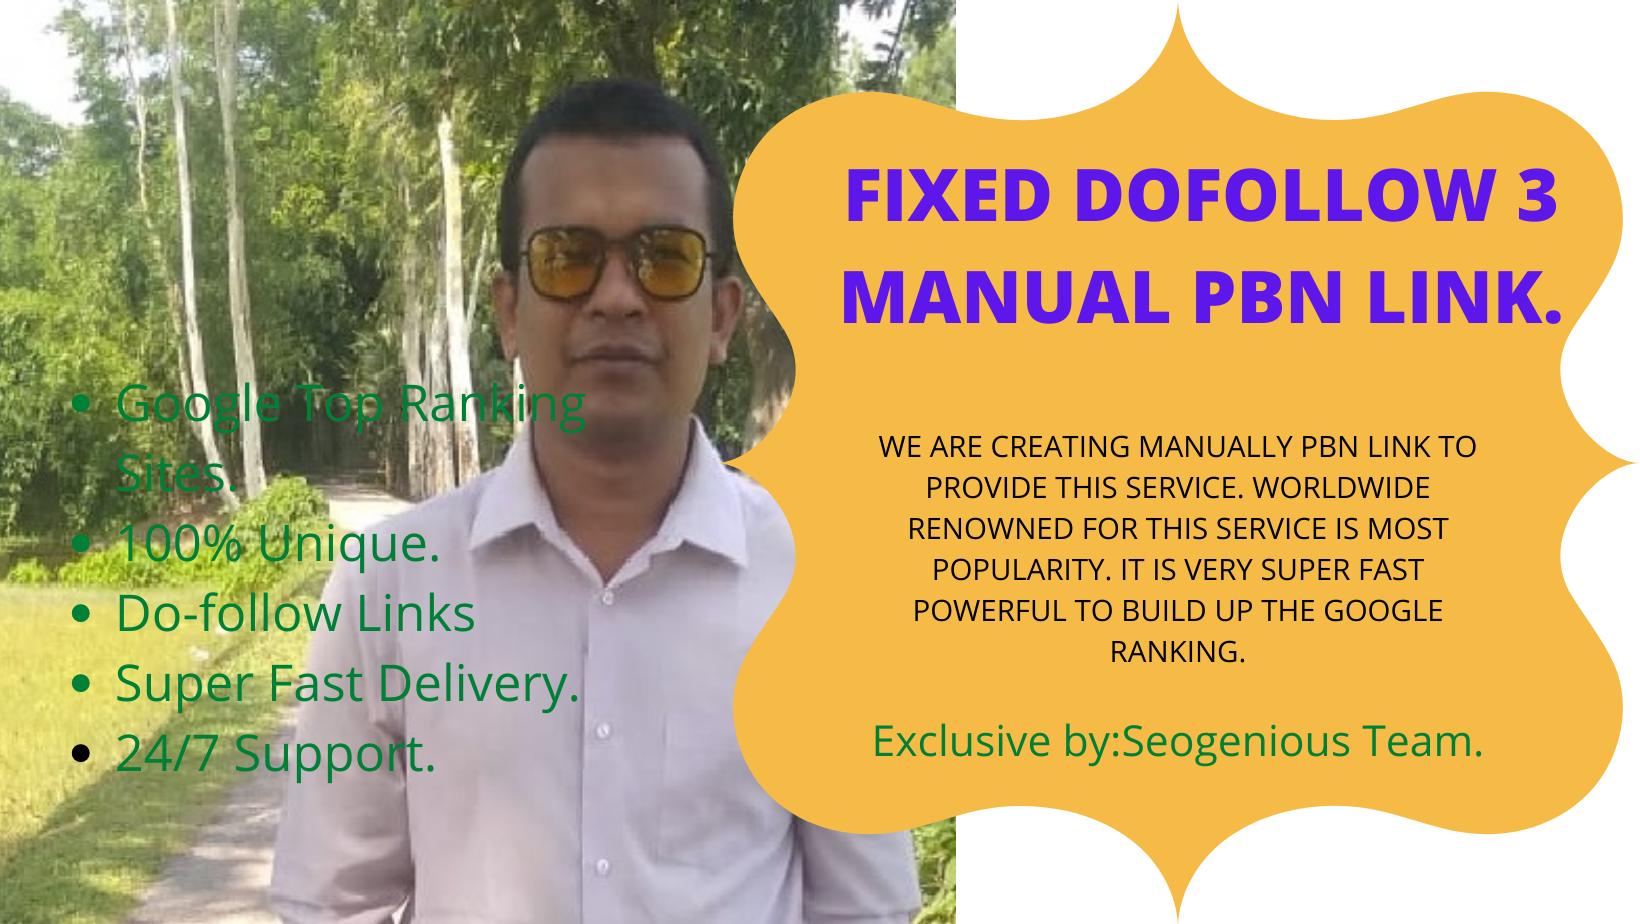 FIXED DOFOLLOW 3 MANUAL PBN LINK